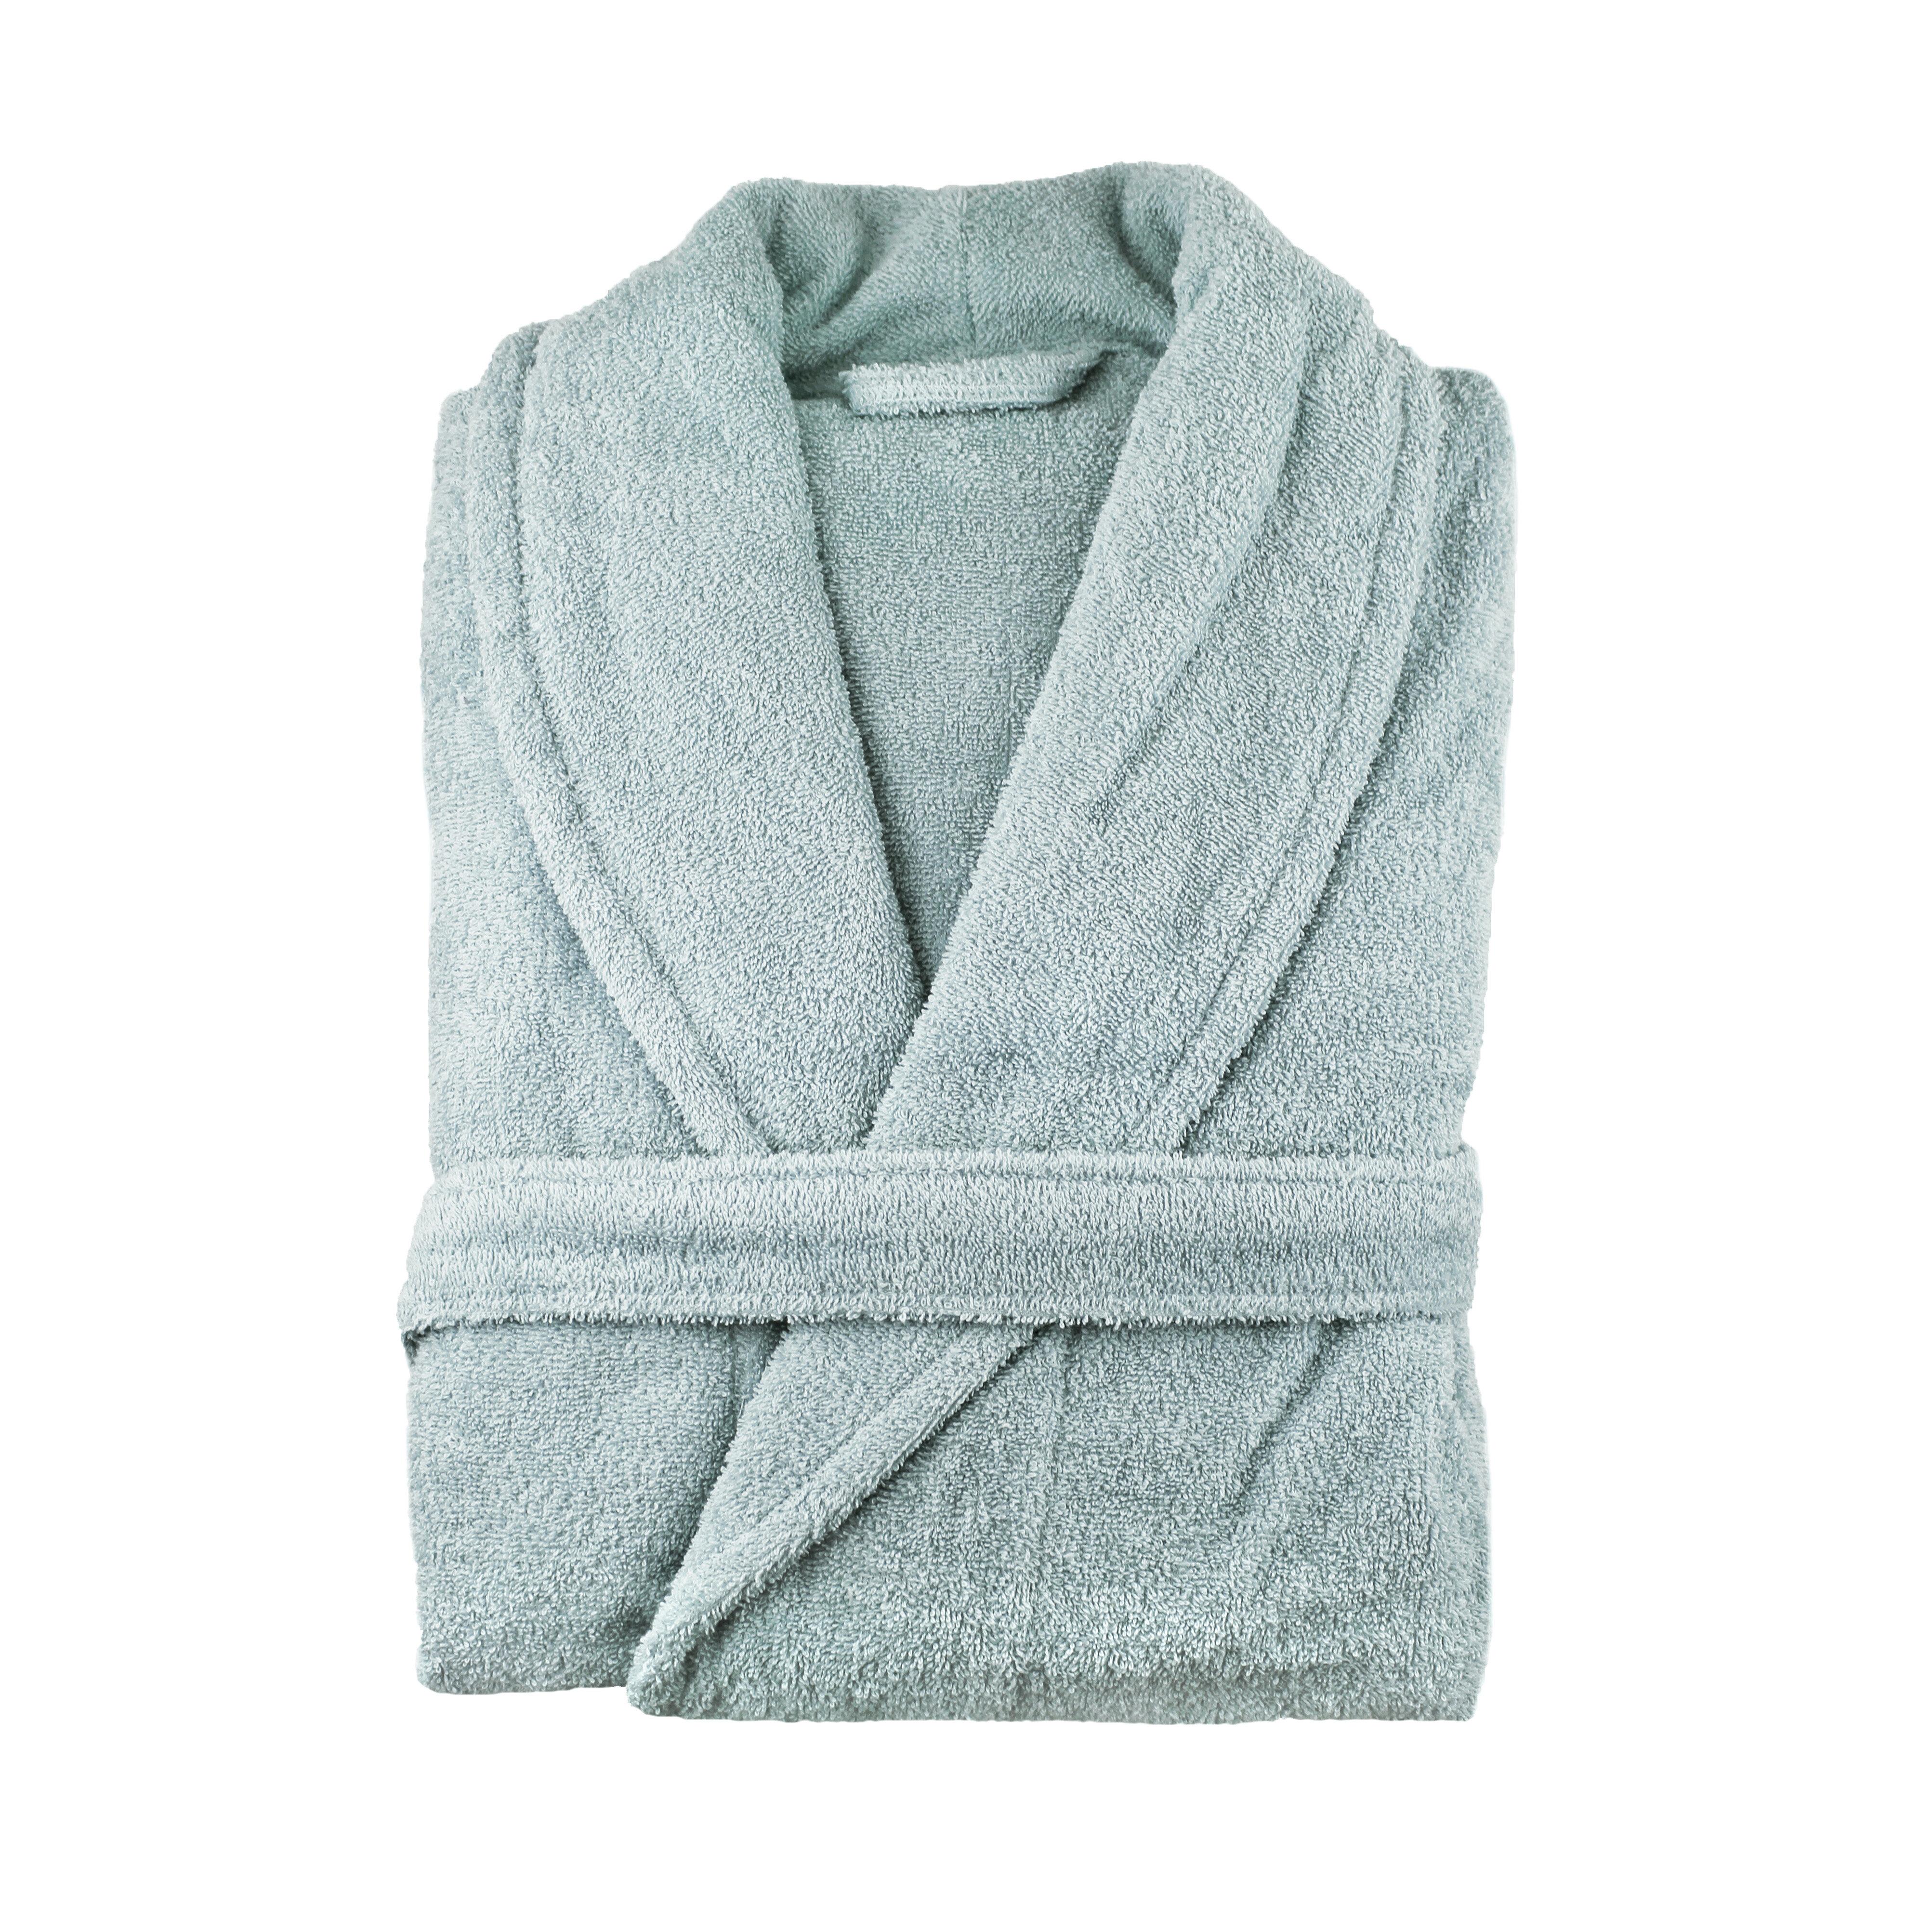 Melange Home 100 Turkish Cotton Terry Cloth Bathrobe Reviews Wayfair